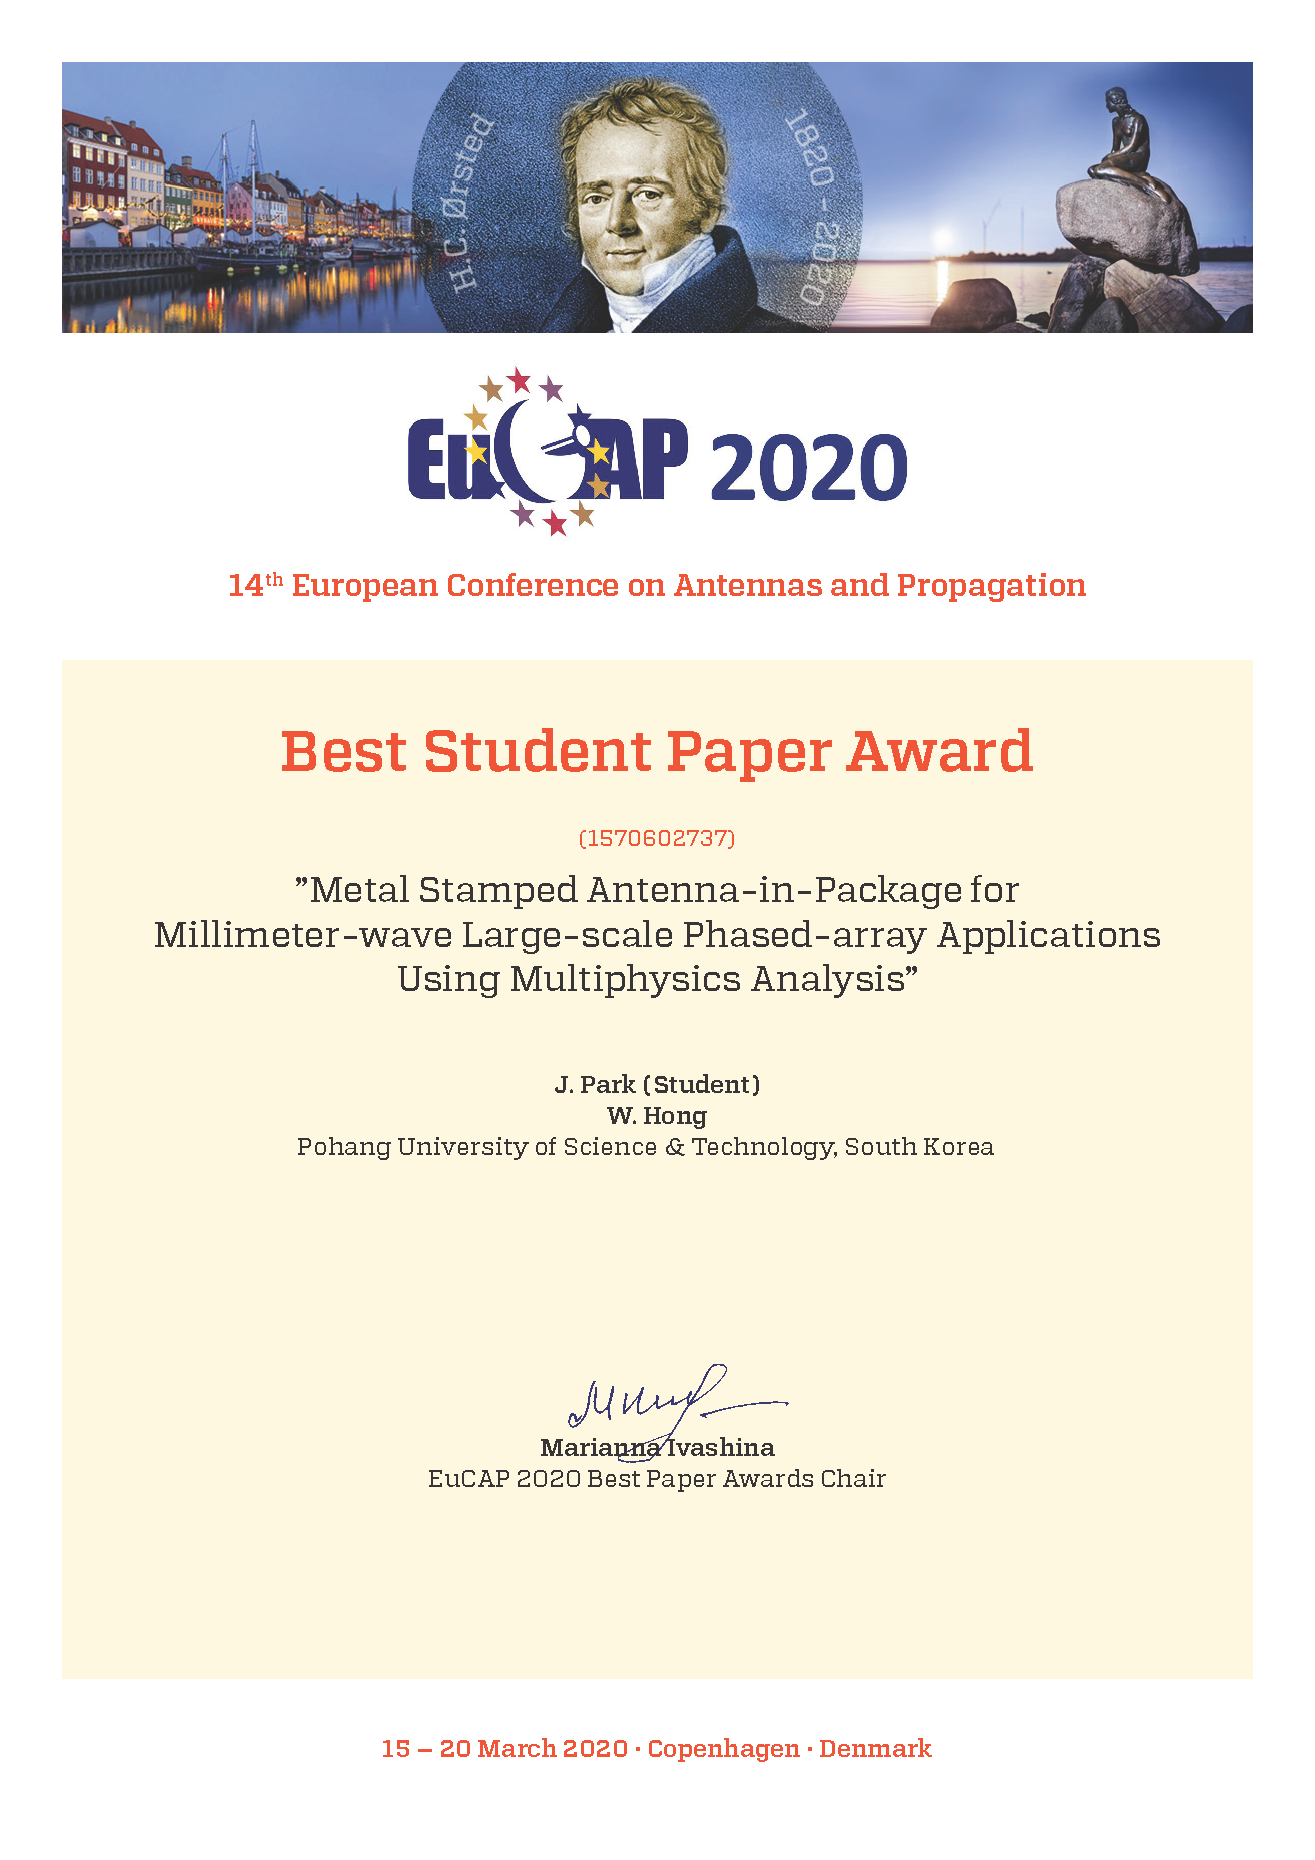 BestStudentPaperAward